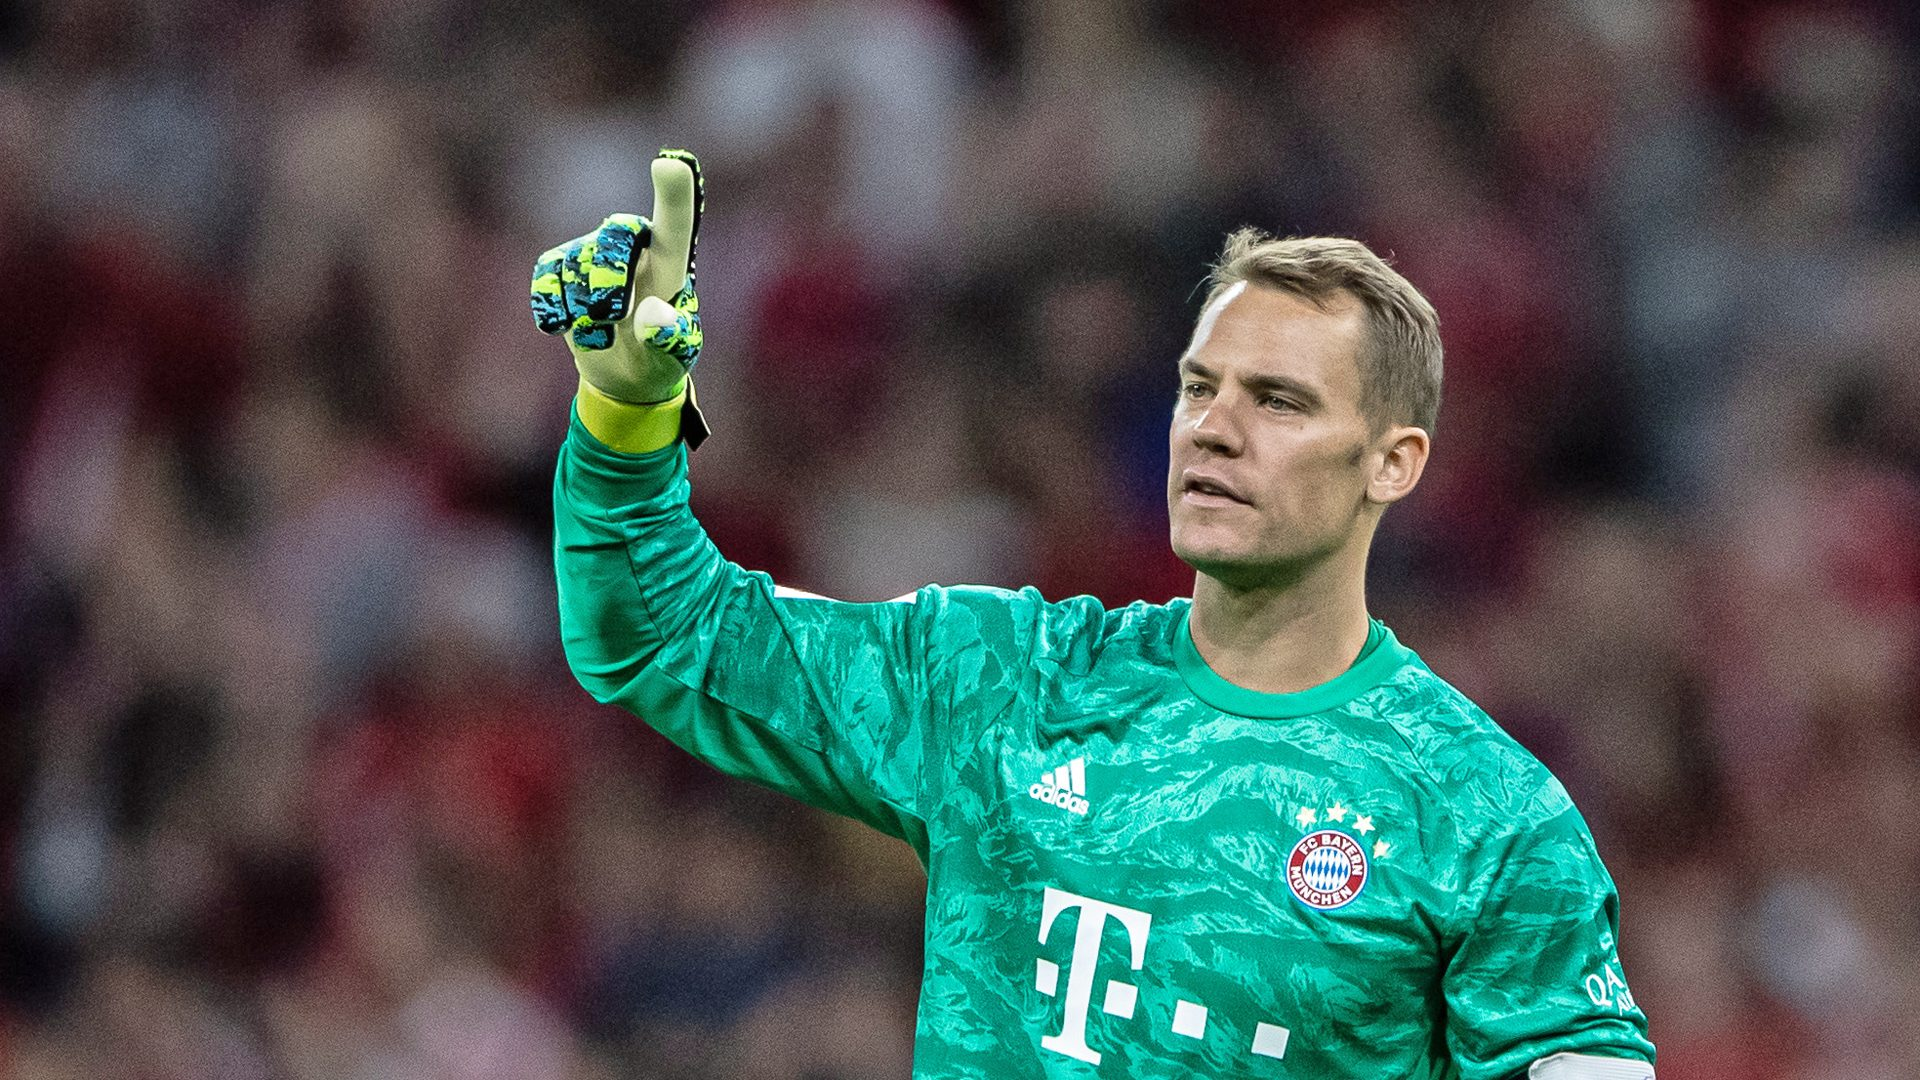 Bundesliga | Manuel Neuer signs new Bayern Munich contract